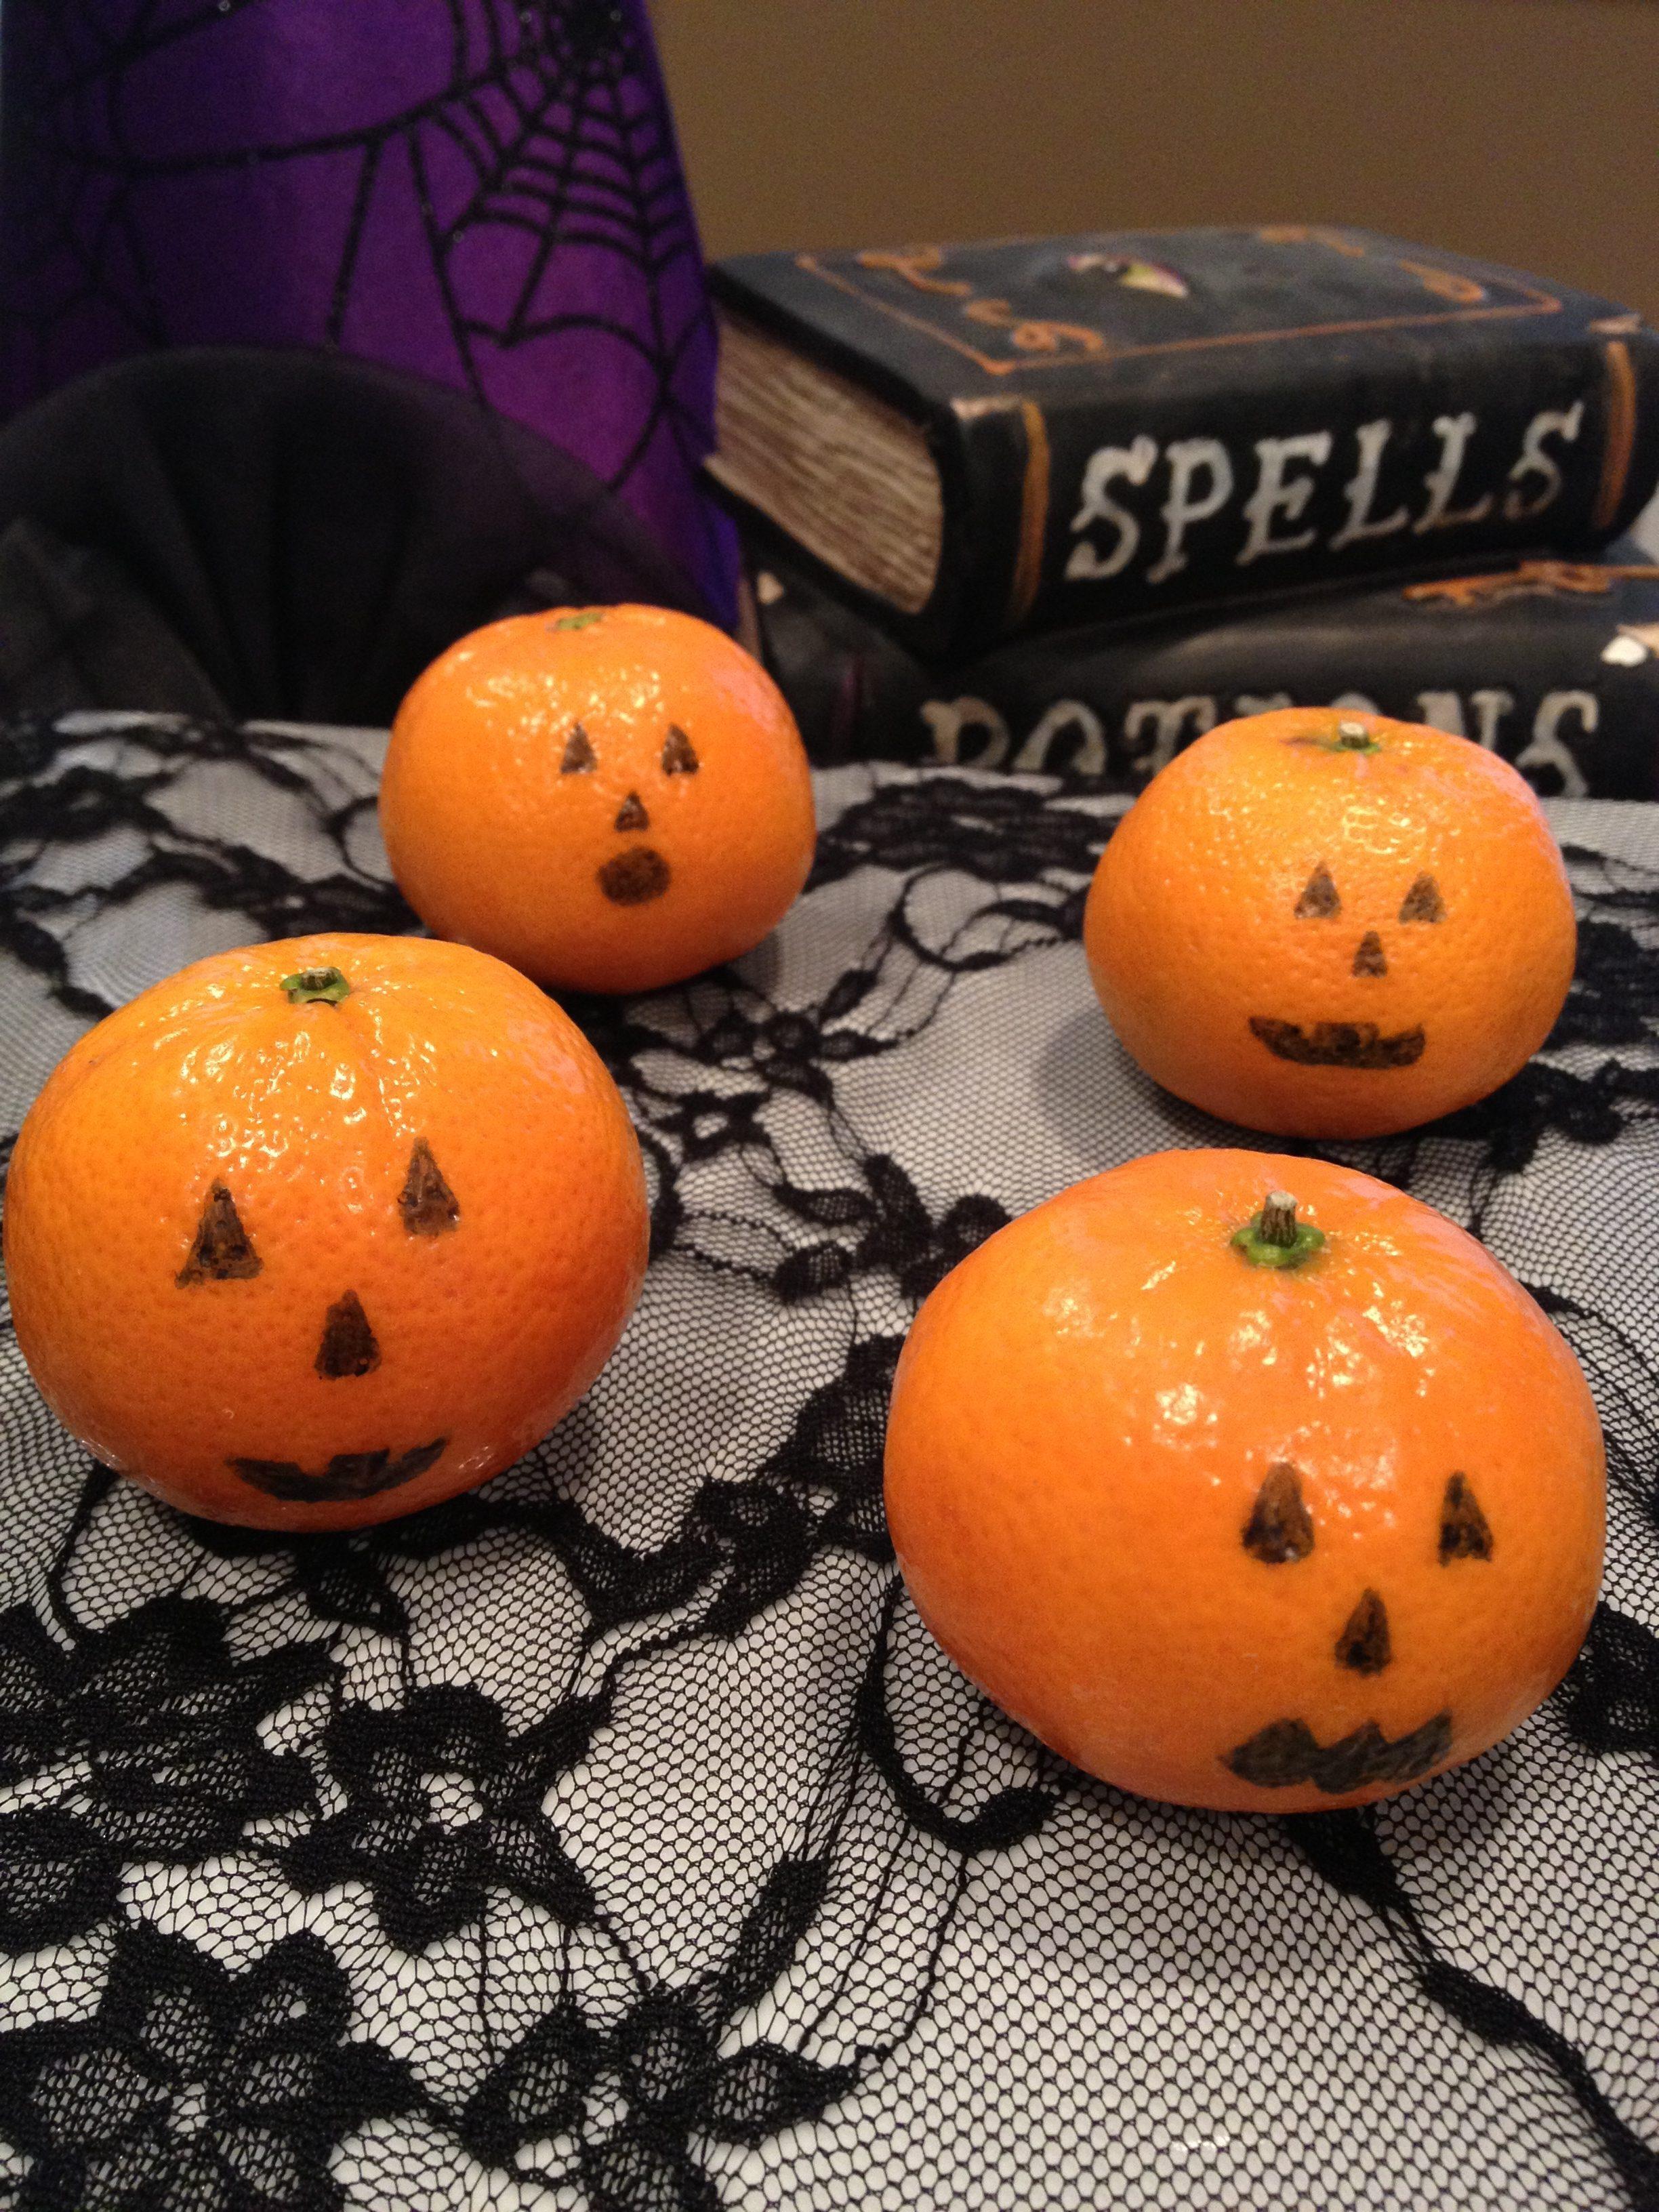 clementine-jack-o-lanterns-healthy-halloween-treat